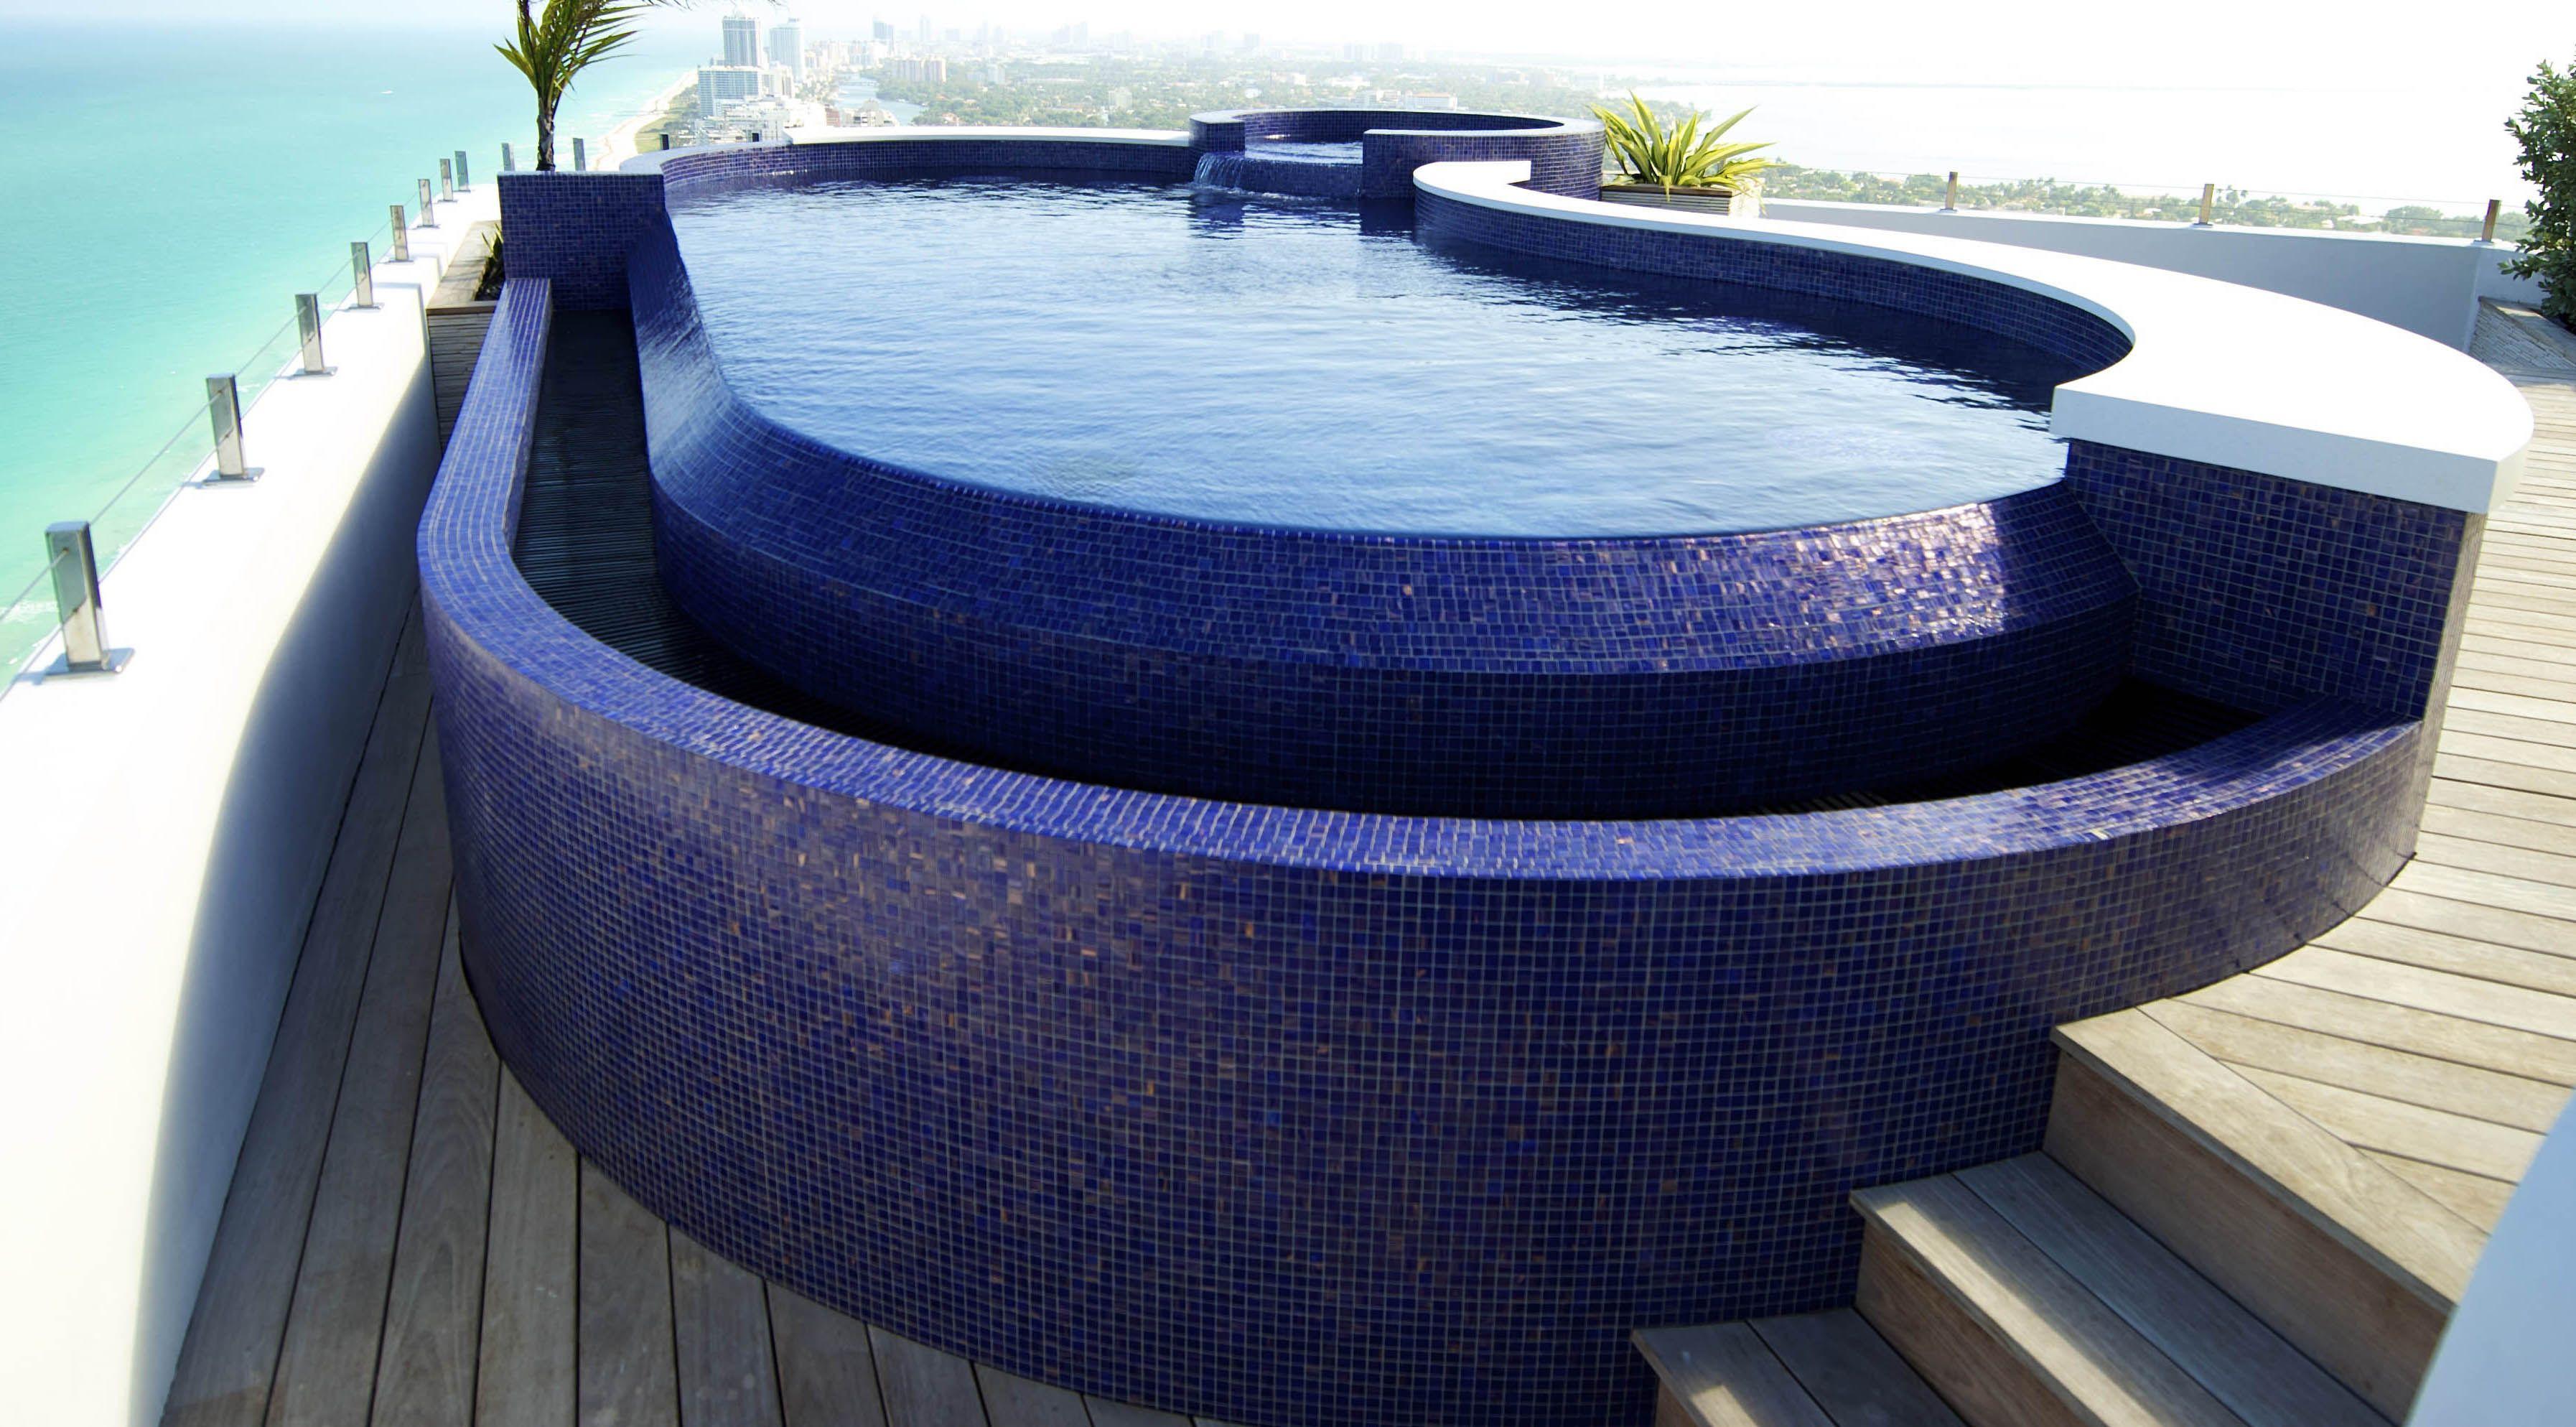 Rooftop Stainless Steel Pool For Residence Pool Pool